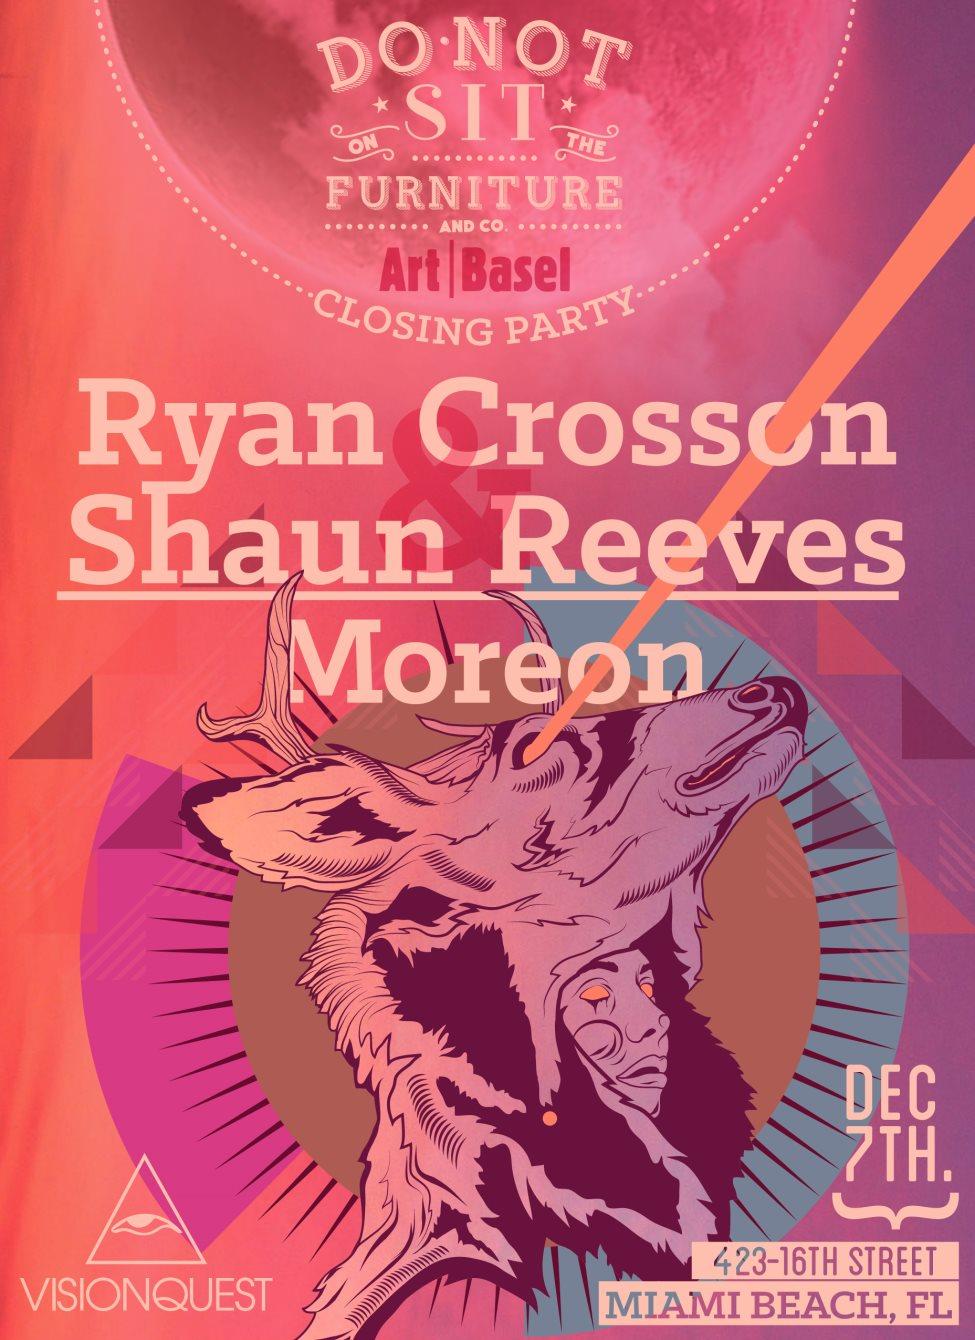 Ryan Crosson & Shaun Reeves: Art Basel Edition - Flyer front